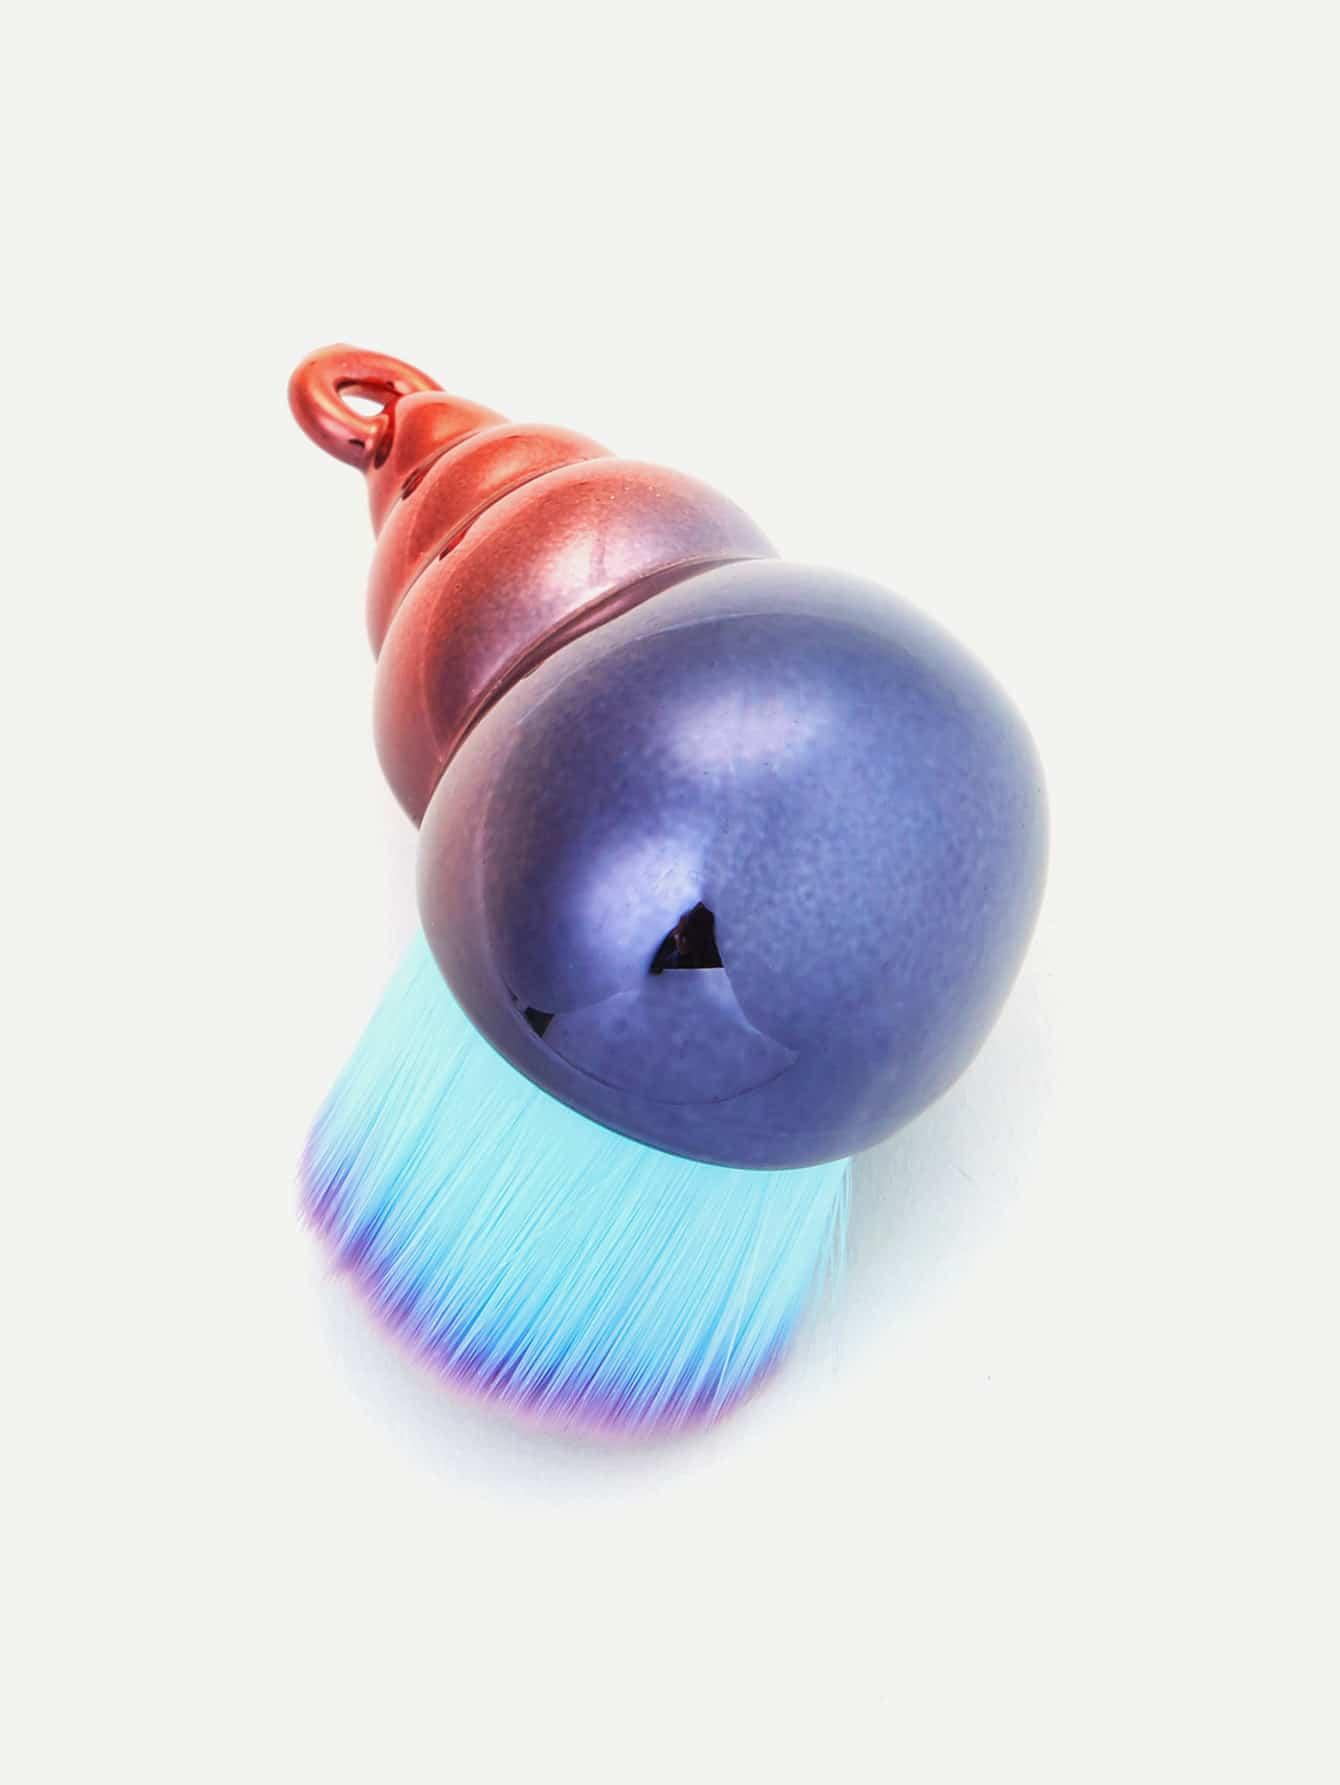 Snails Handle Design Facial Cleansing Brush 1Pc deep face cleansing brush facial cleanser 2 speeds electric face wash machine